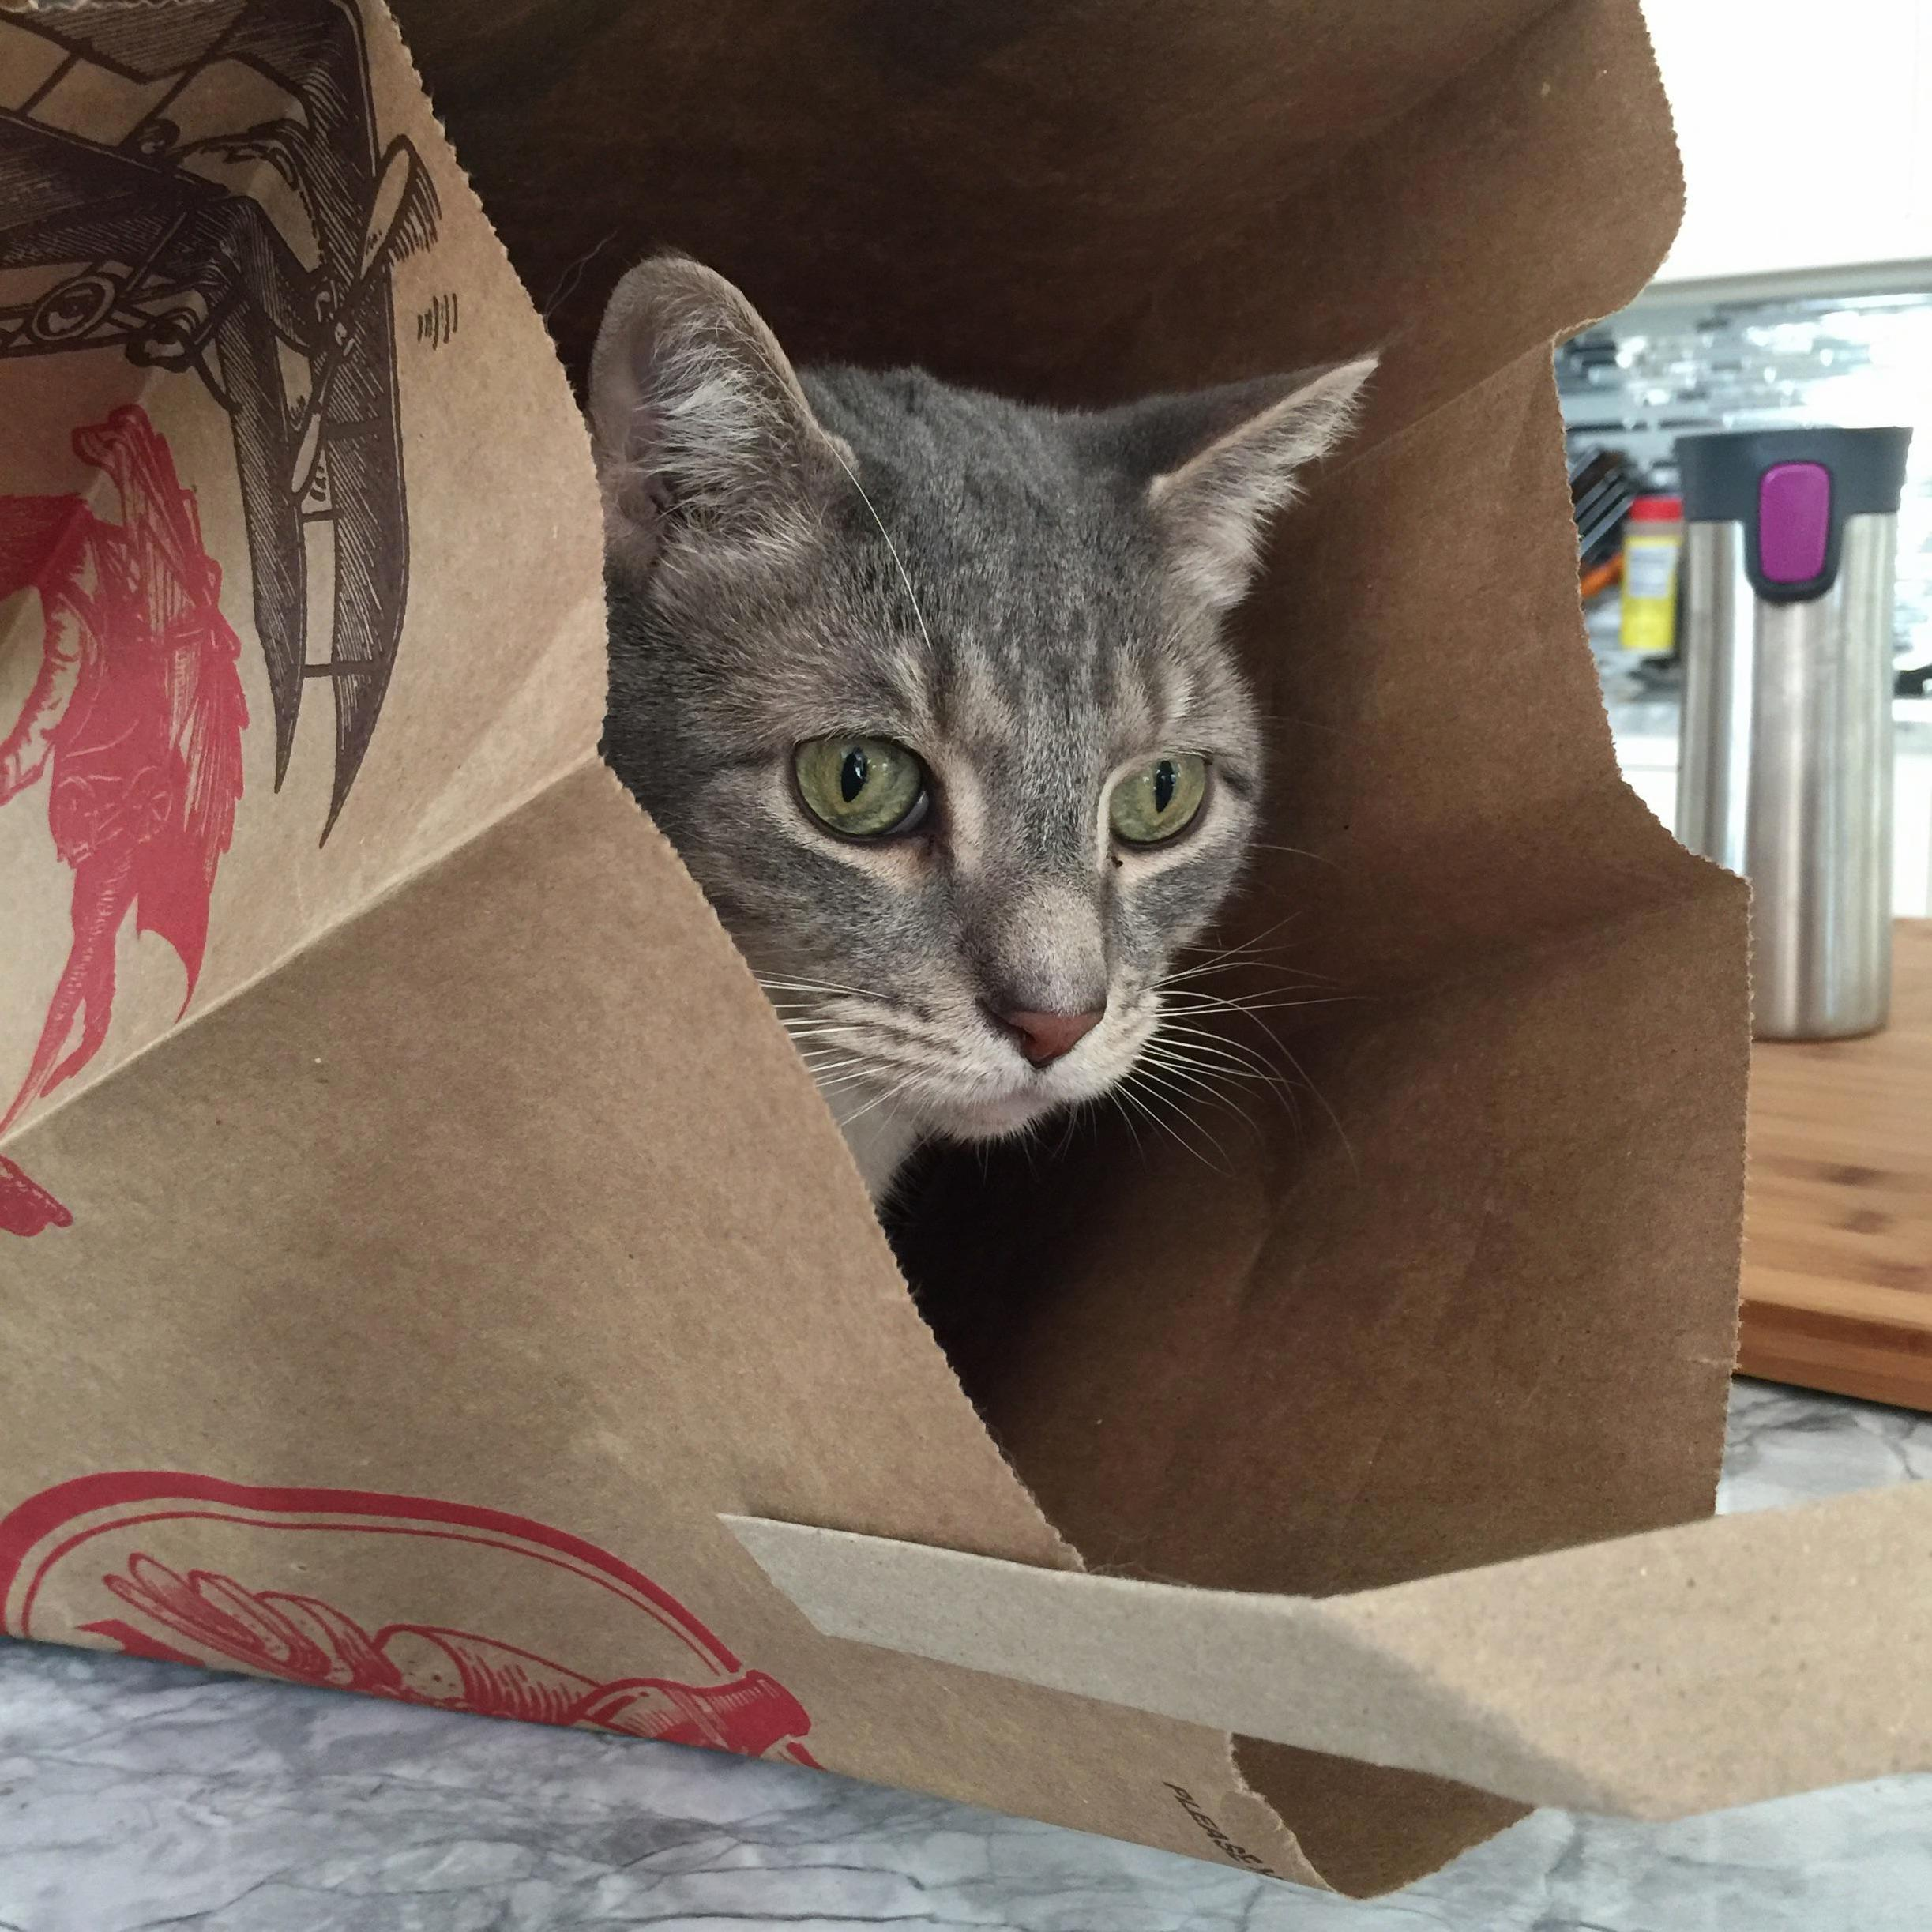 Milo in a bag.